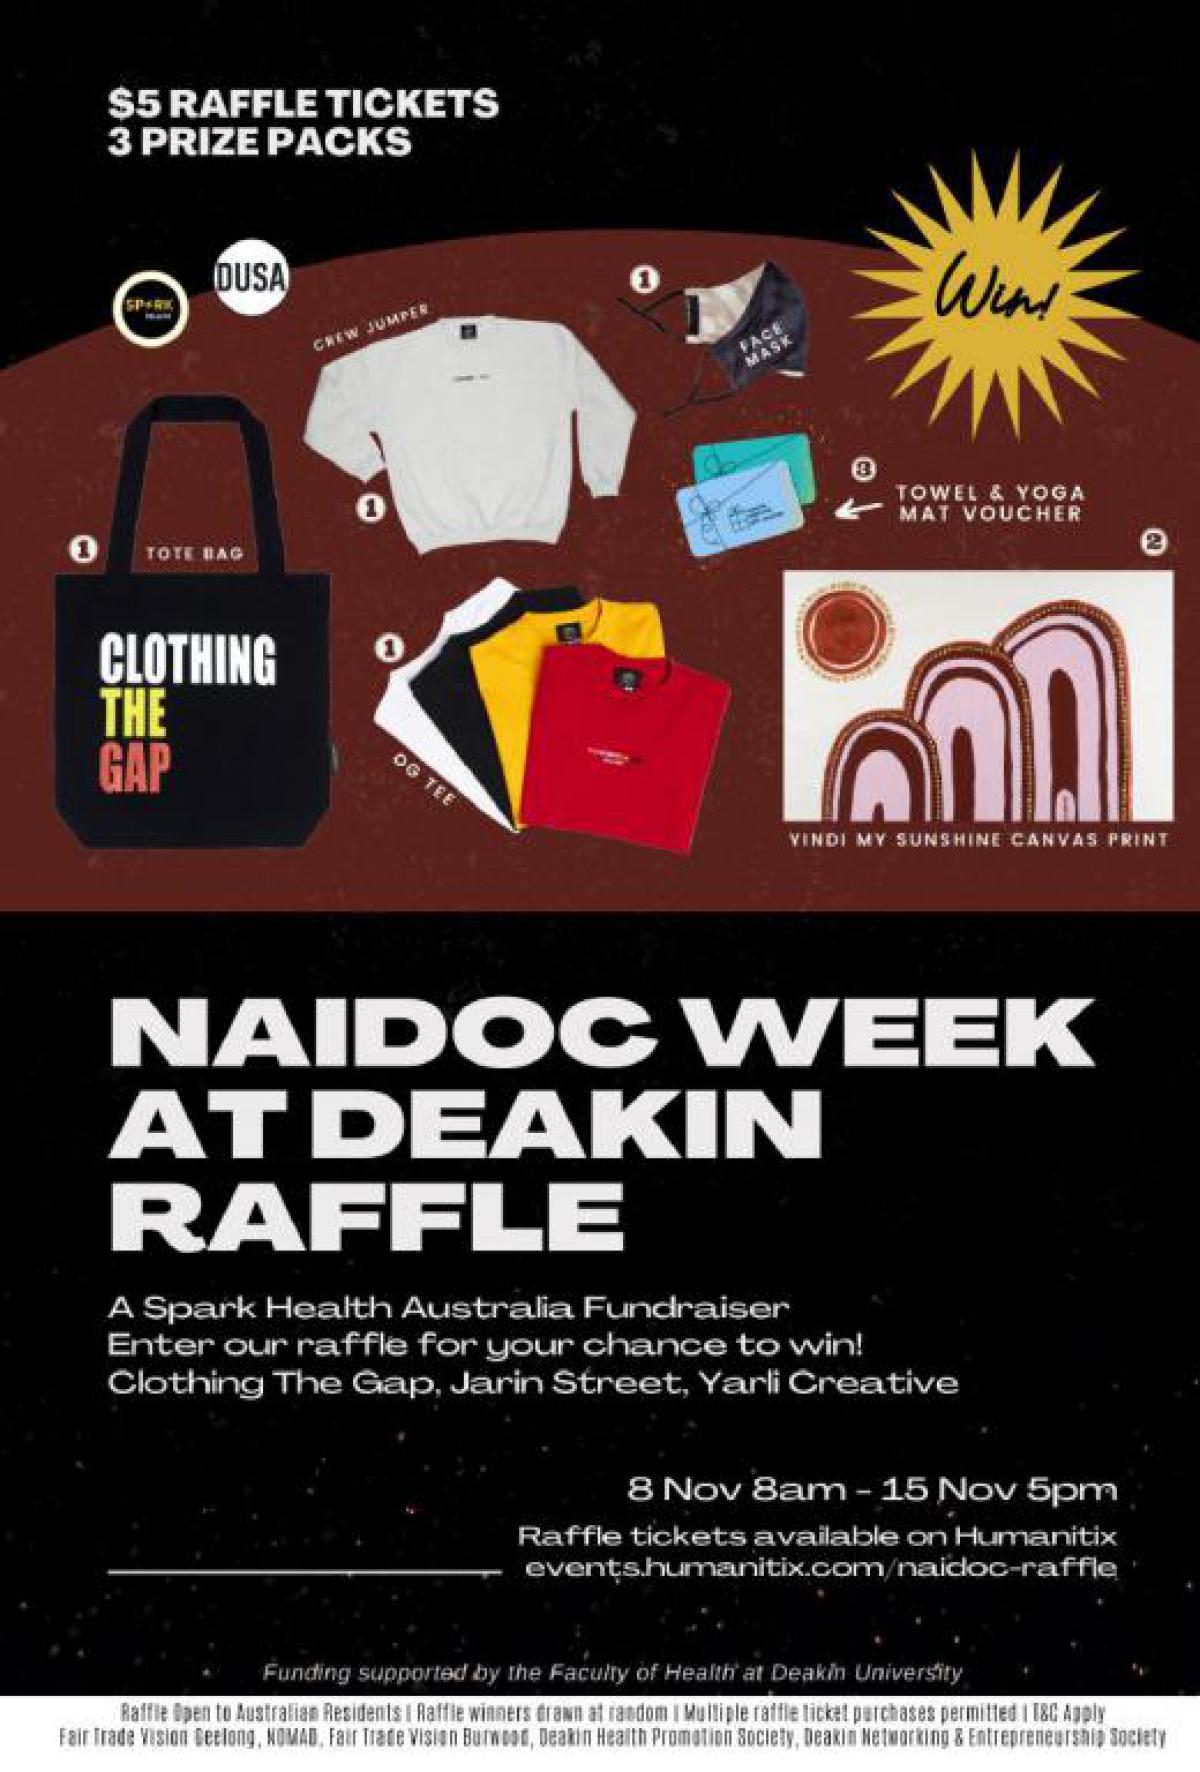 NAIDOC Week at Deakin Raffle - Funds for SparkHealth